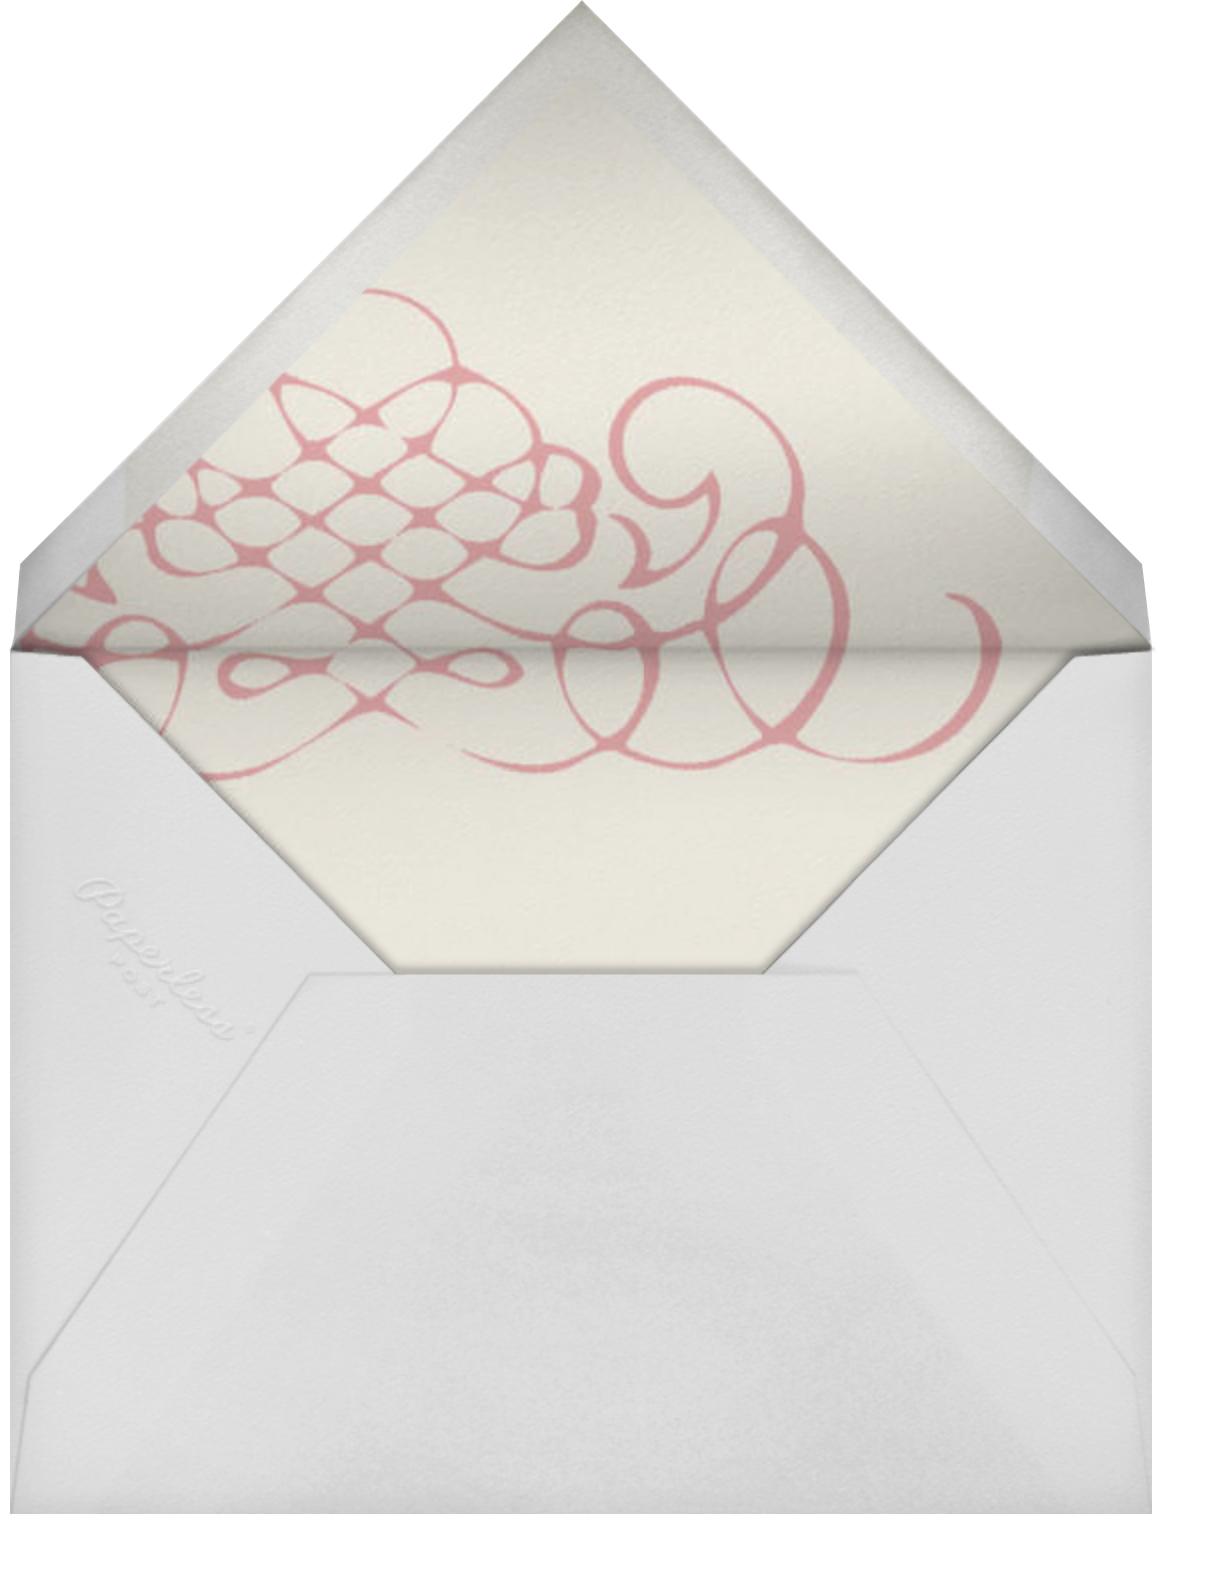 Antique Press- Cream with Tea Rose (Horizontal) - Paperless Post - Envelope